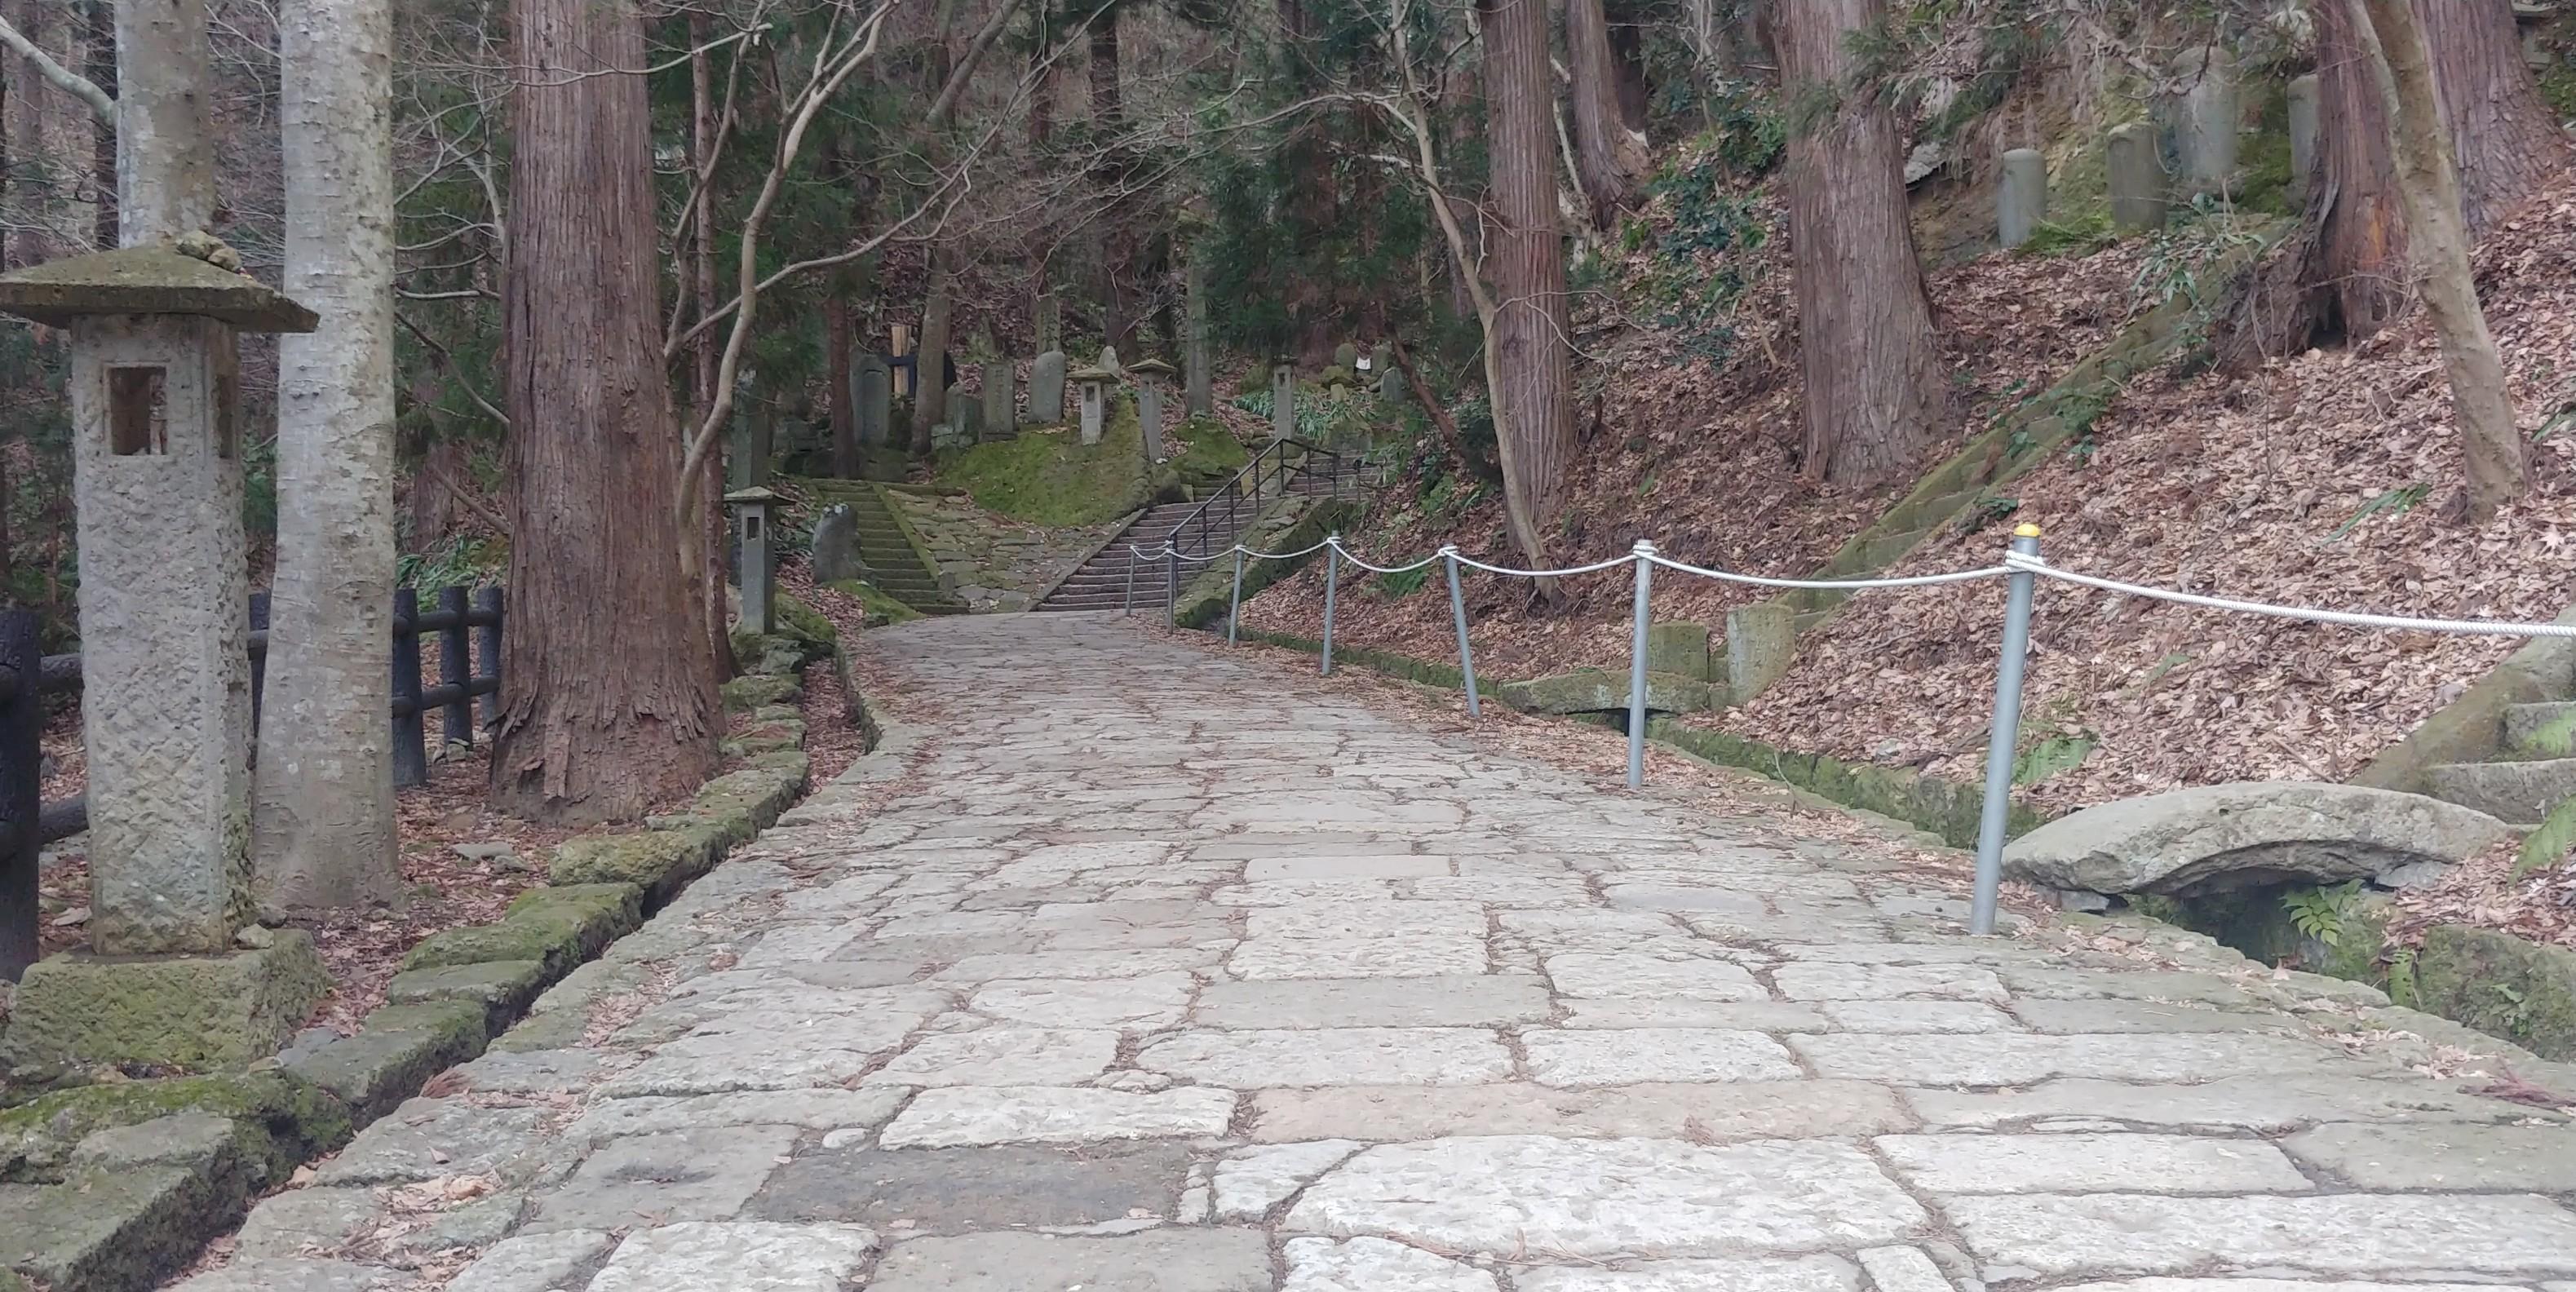 f:id:kishuji-kaisoku:20200127111722j:image